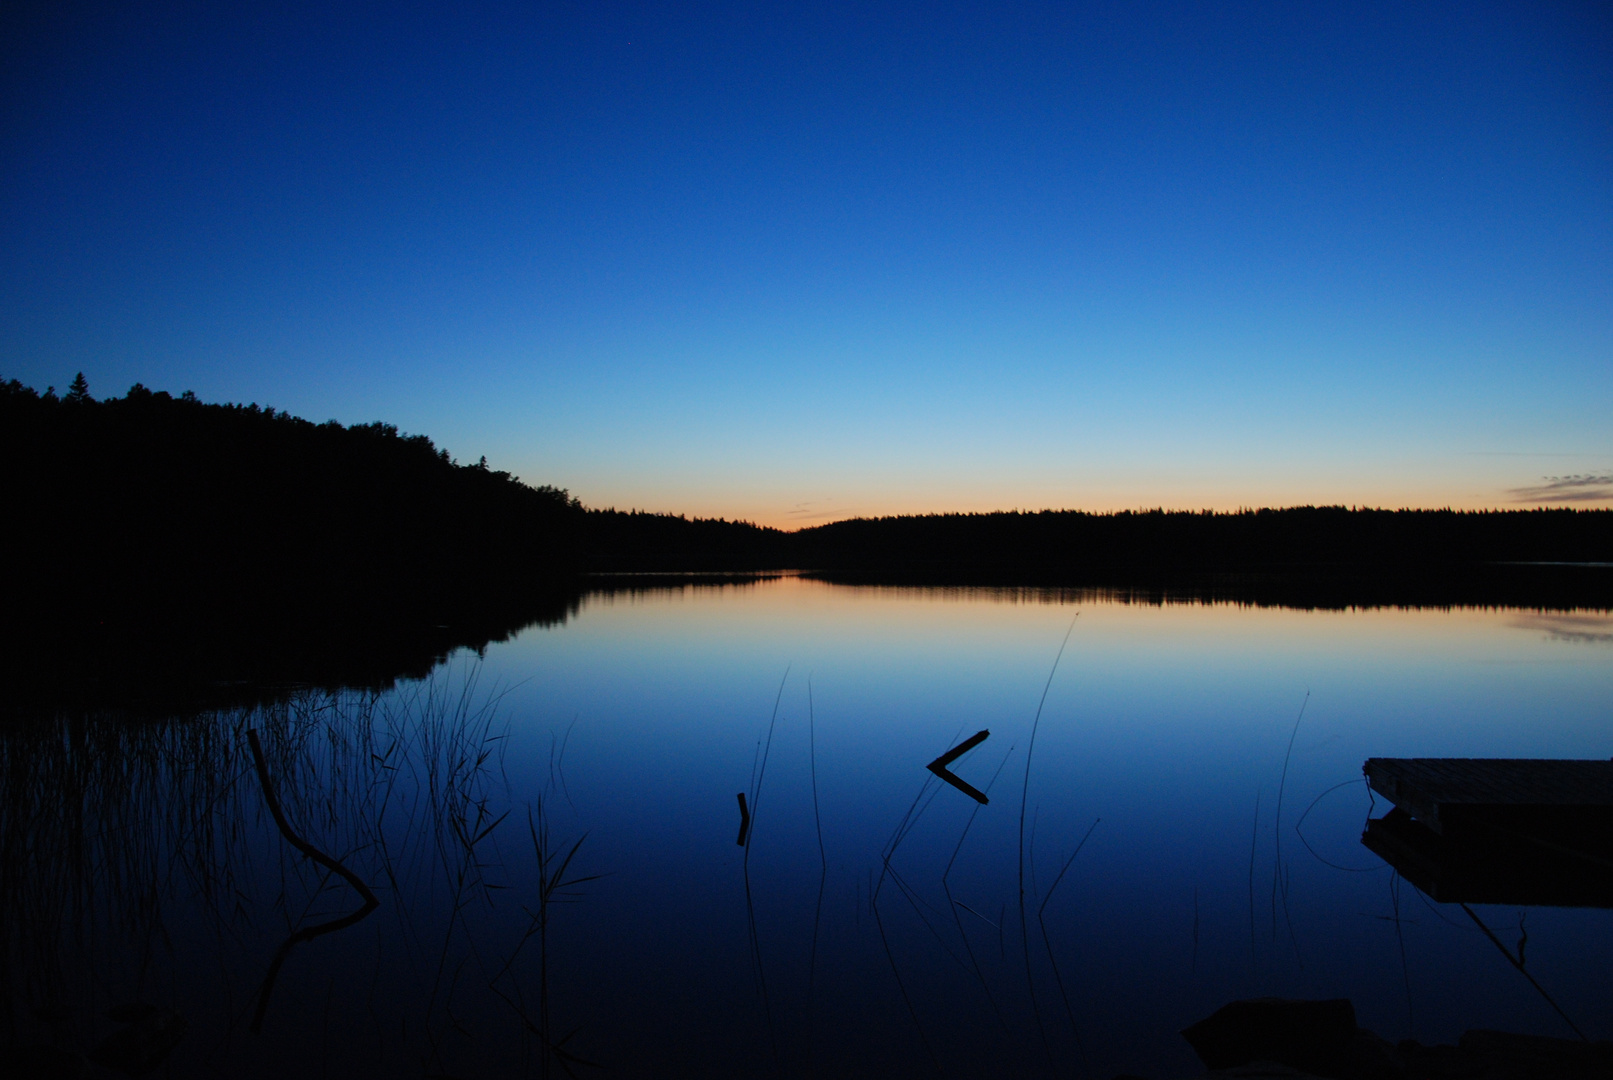 Abendstimmung am Kiasjön